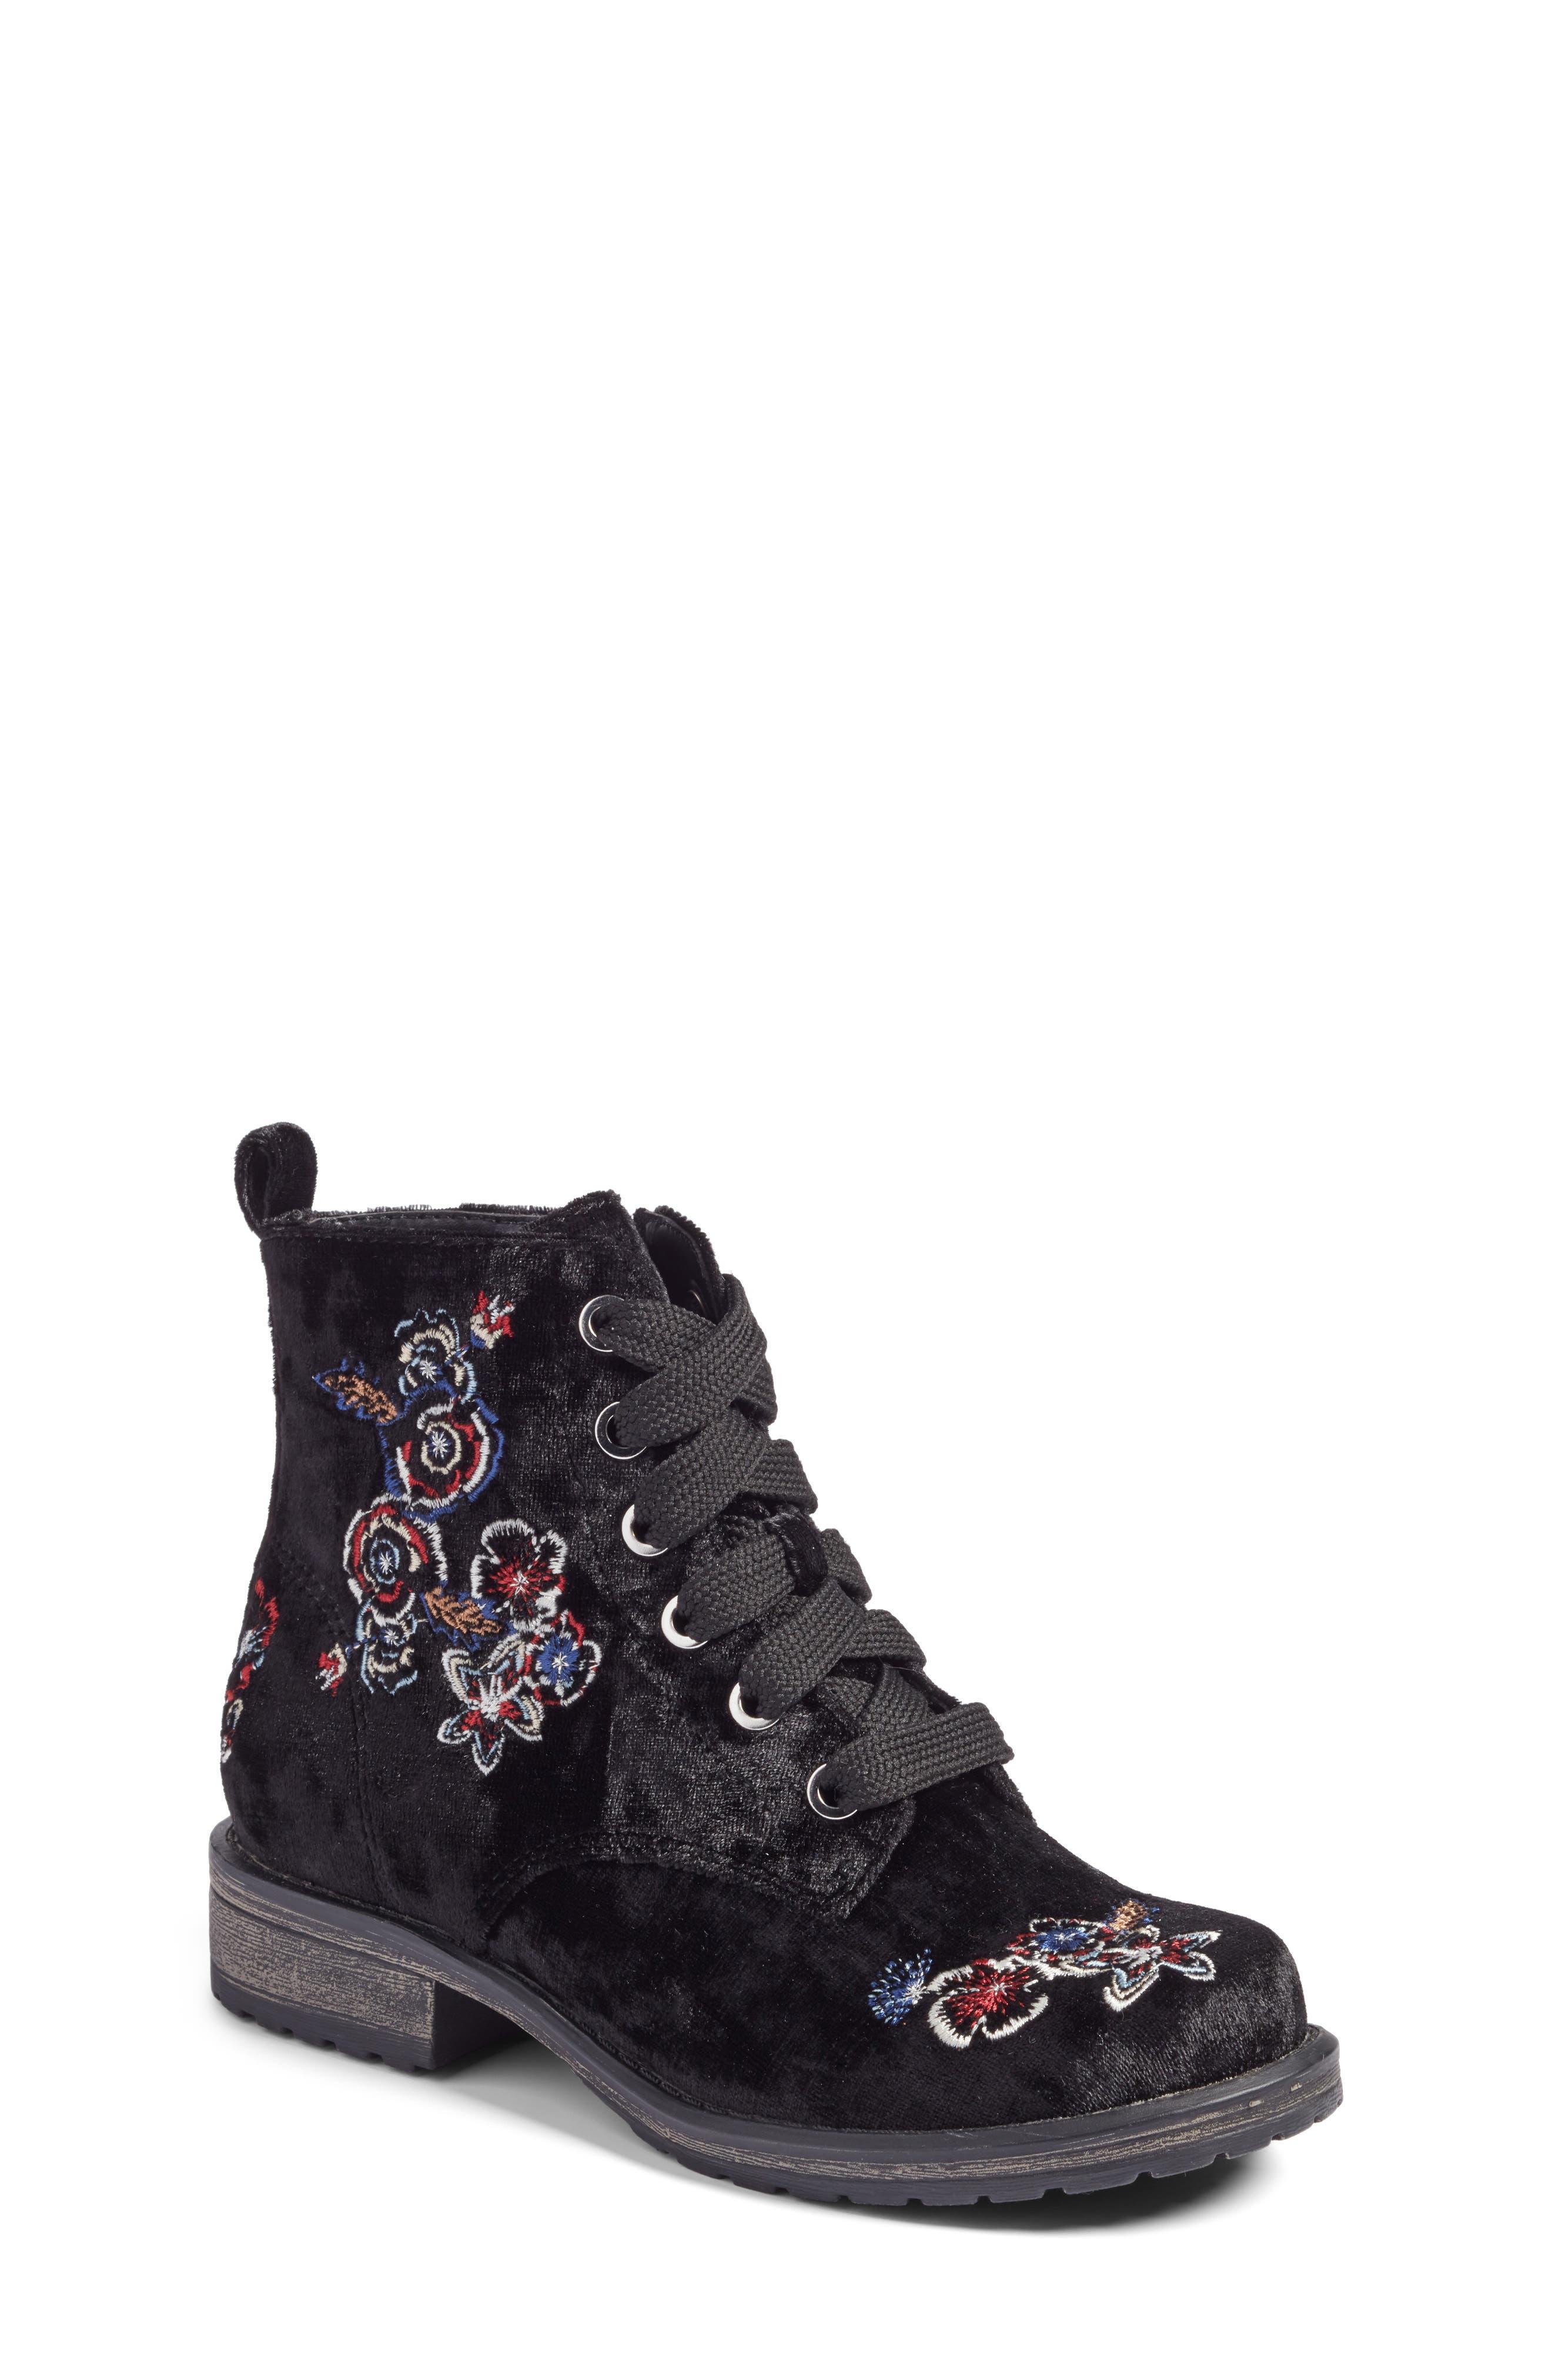 Lilla Combat Boot,                         Main,                         color, Black Multi Velvet